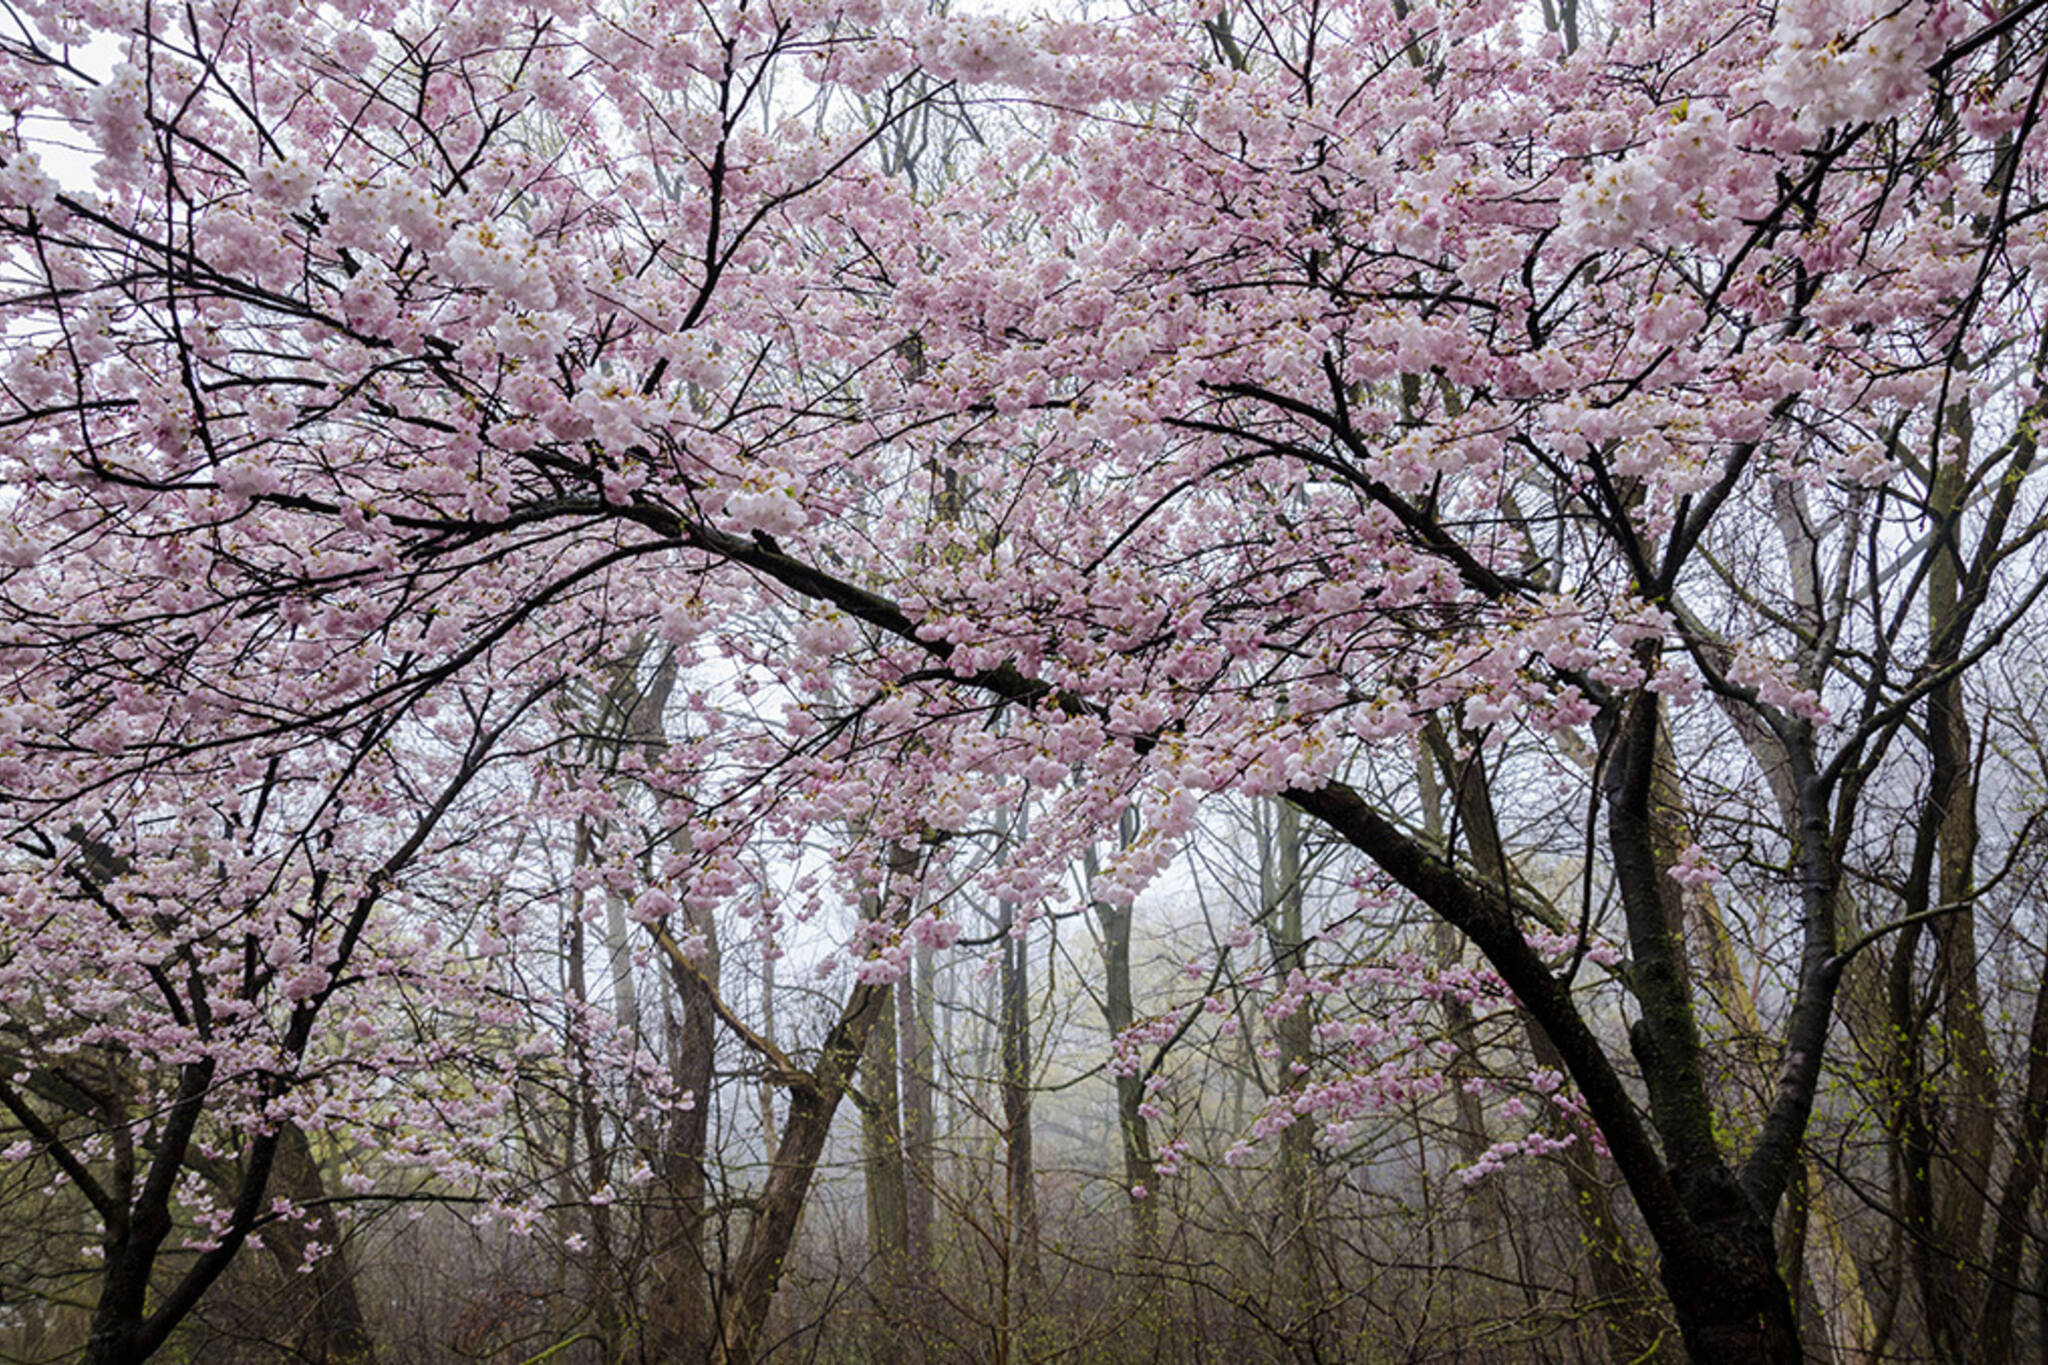 high park cherry blossoms 2017